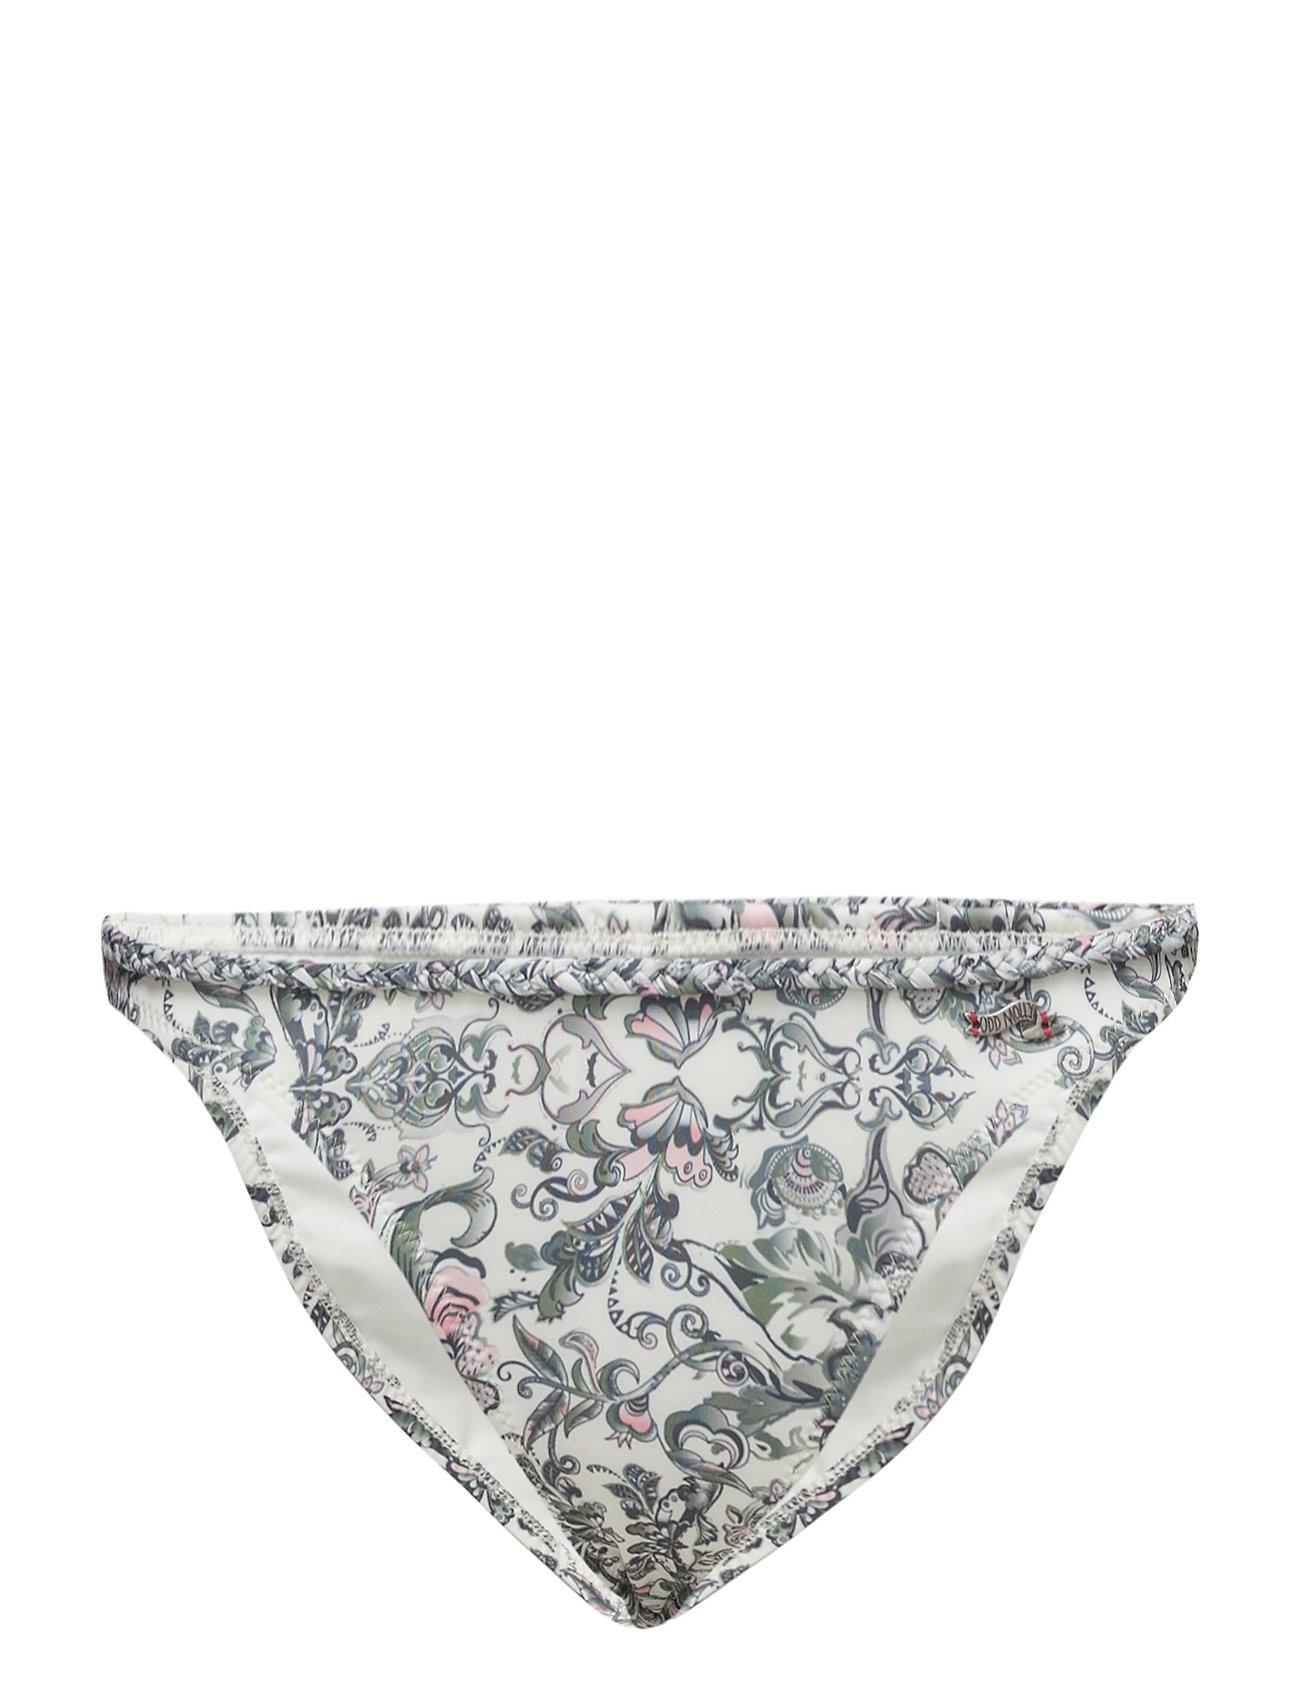 ODD MOLLY UNDERWEAR & SWIMWEAR goosebumps bikini bottom - VINTAGE MILITARY